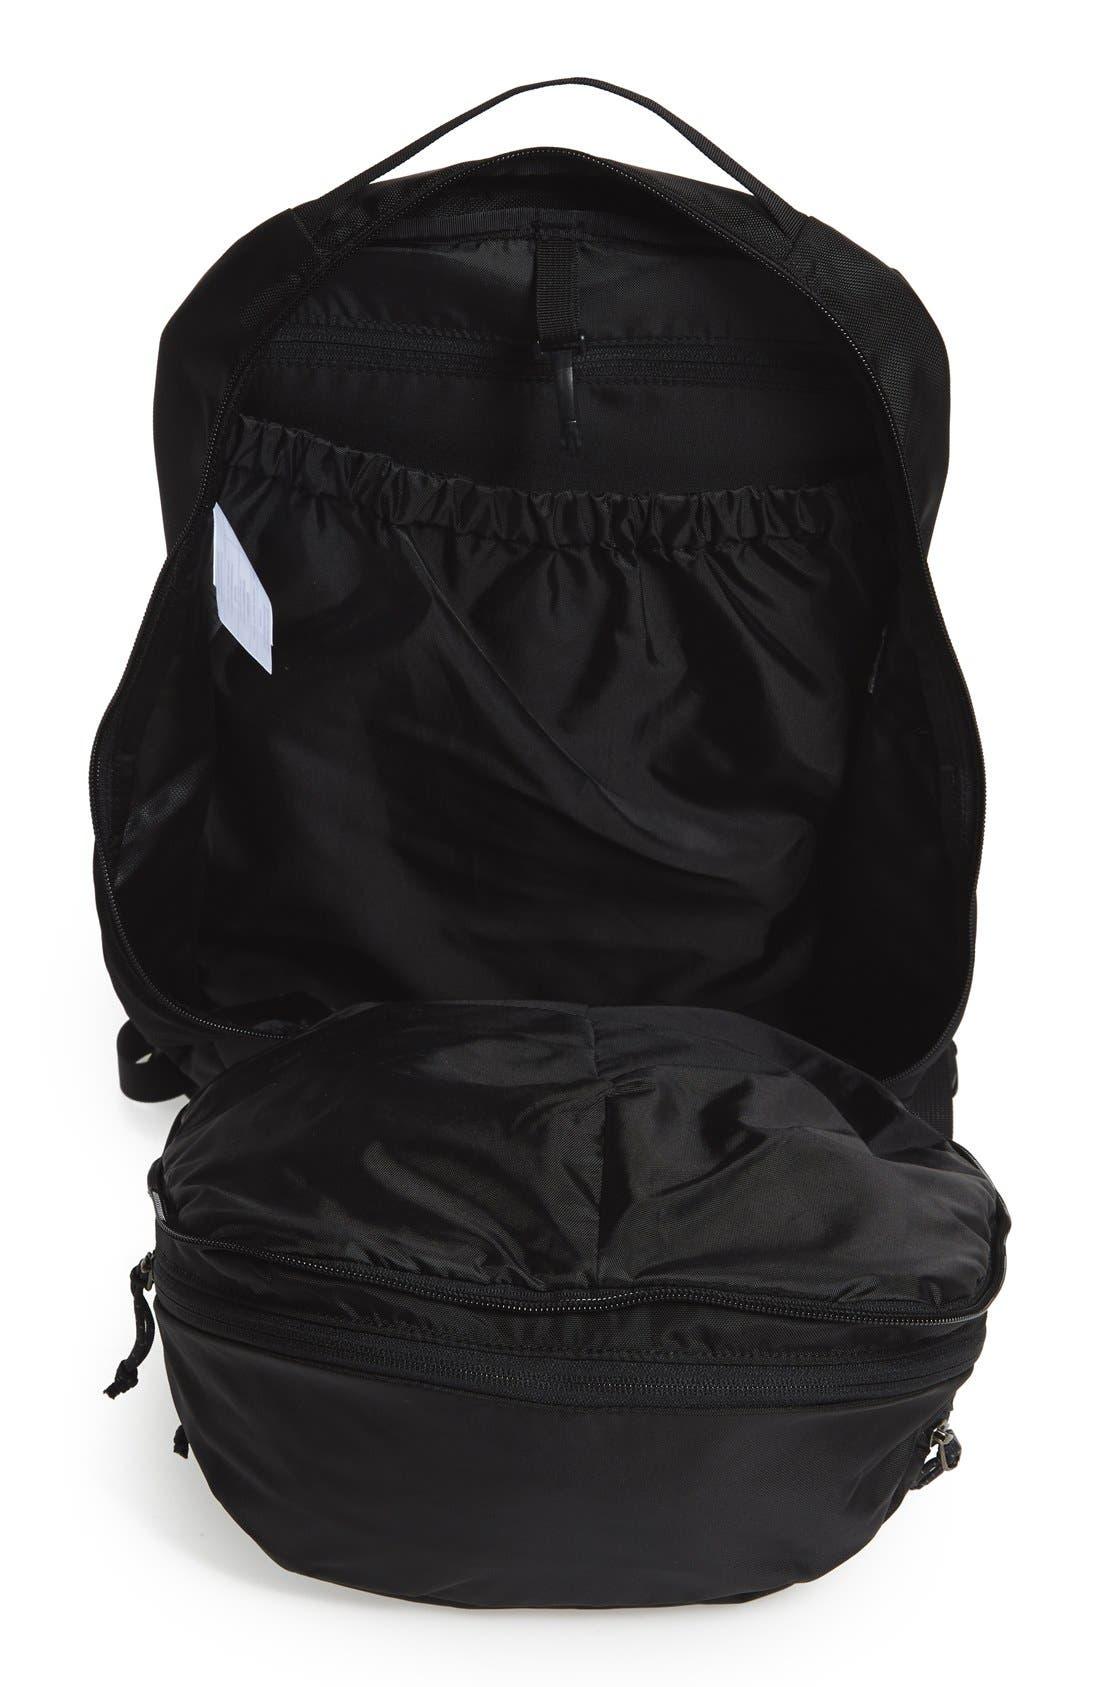 ARC'TERYX,                             'Mantis 26L' Backpack,                             Alternate thumbnail 4, color,                             001